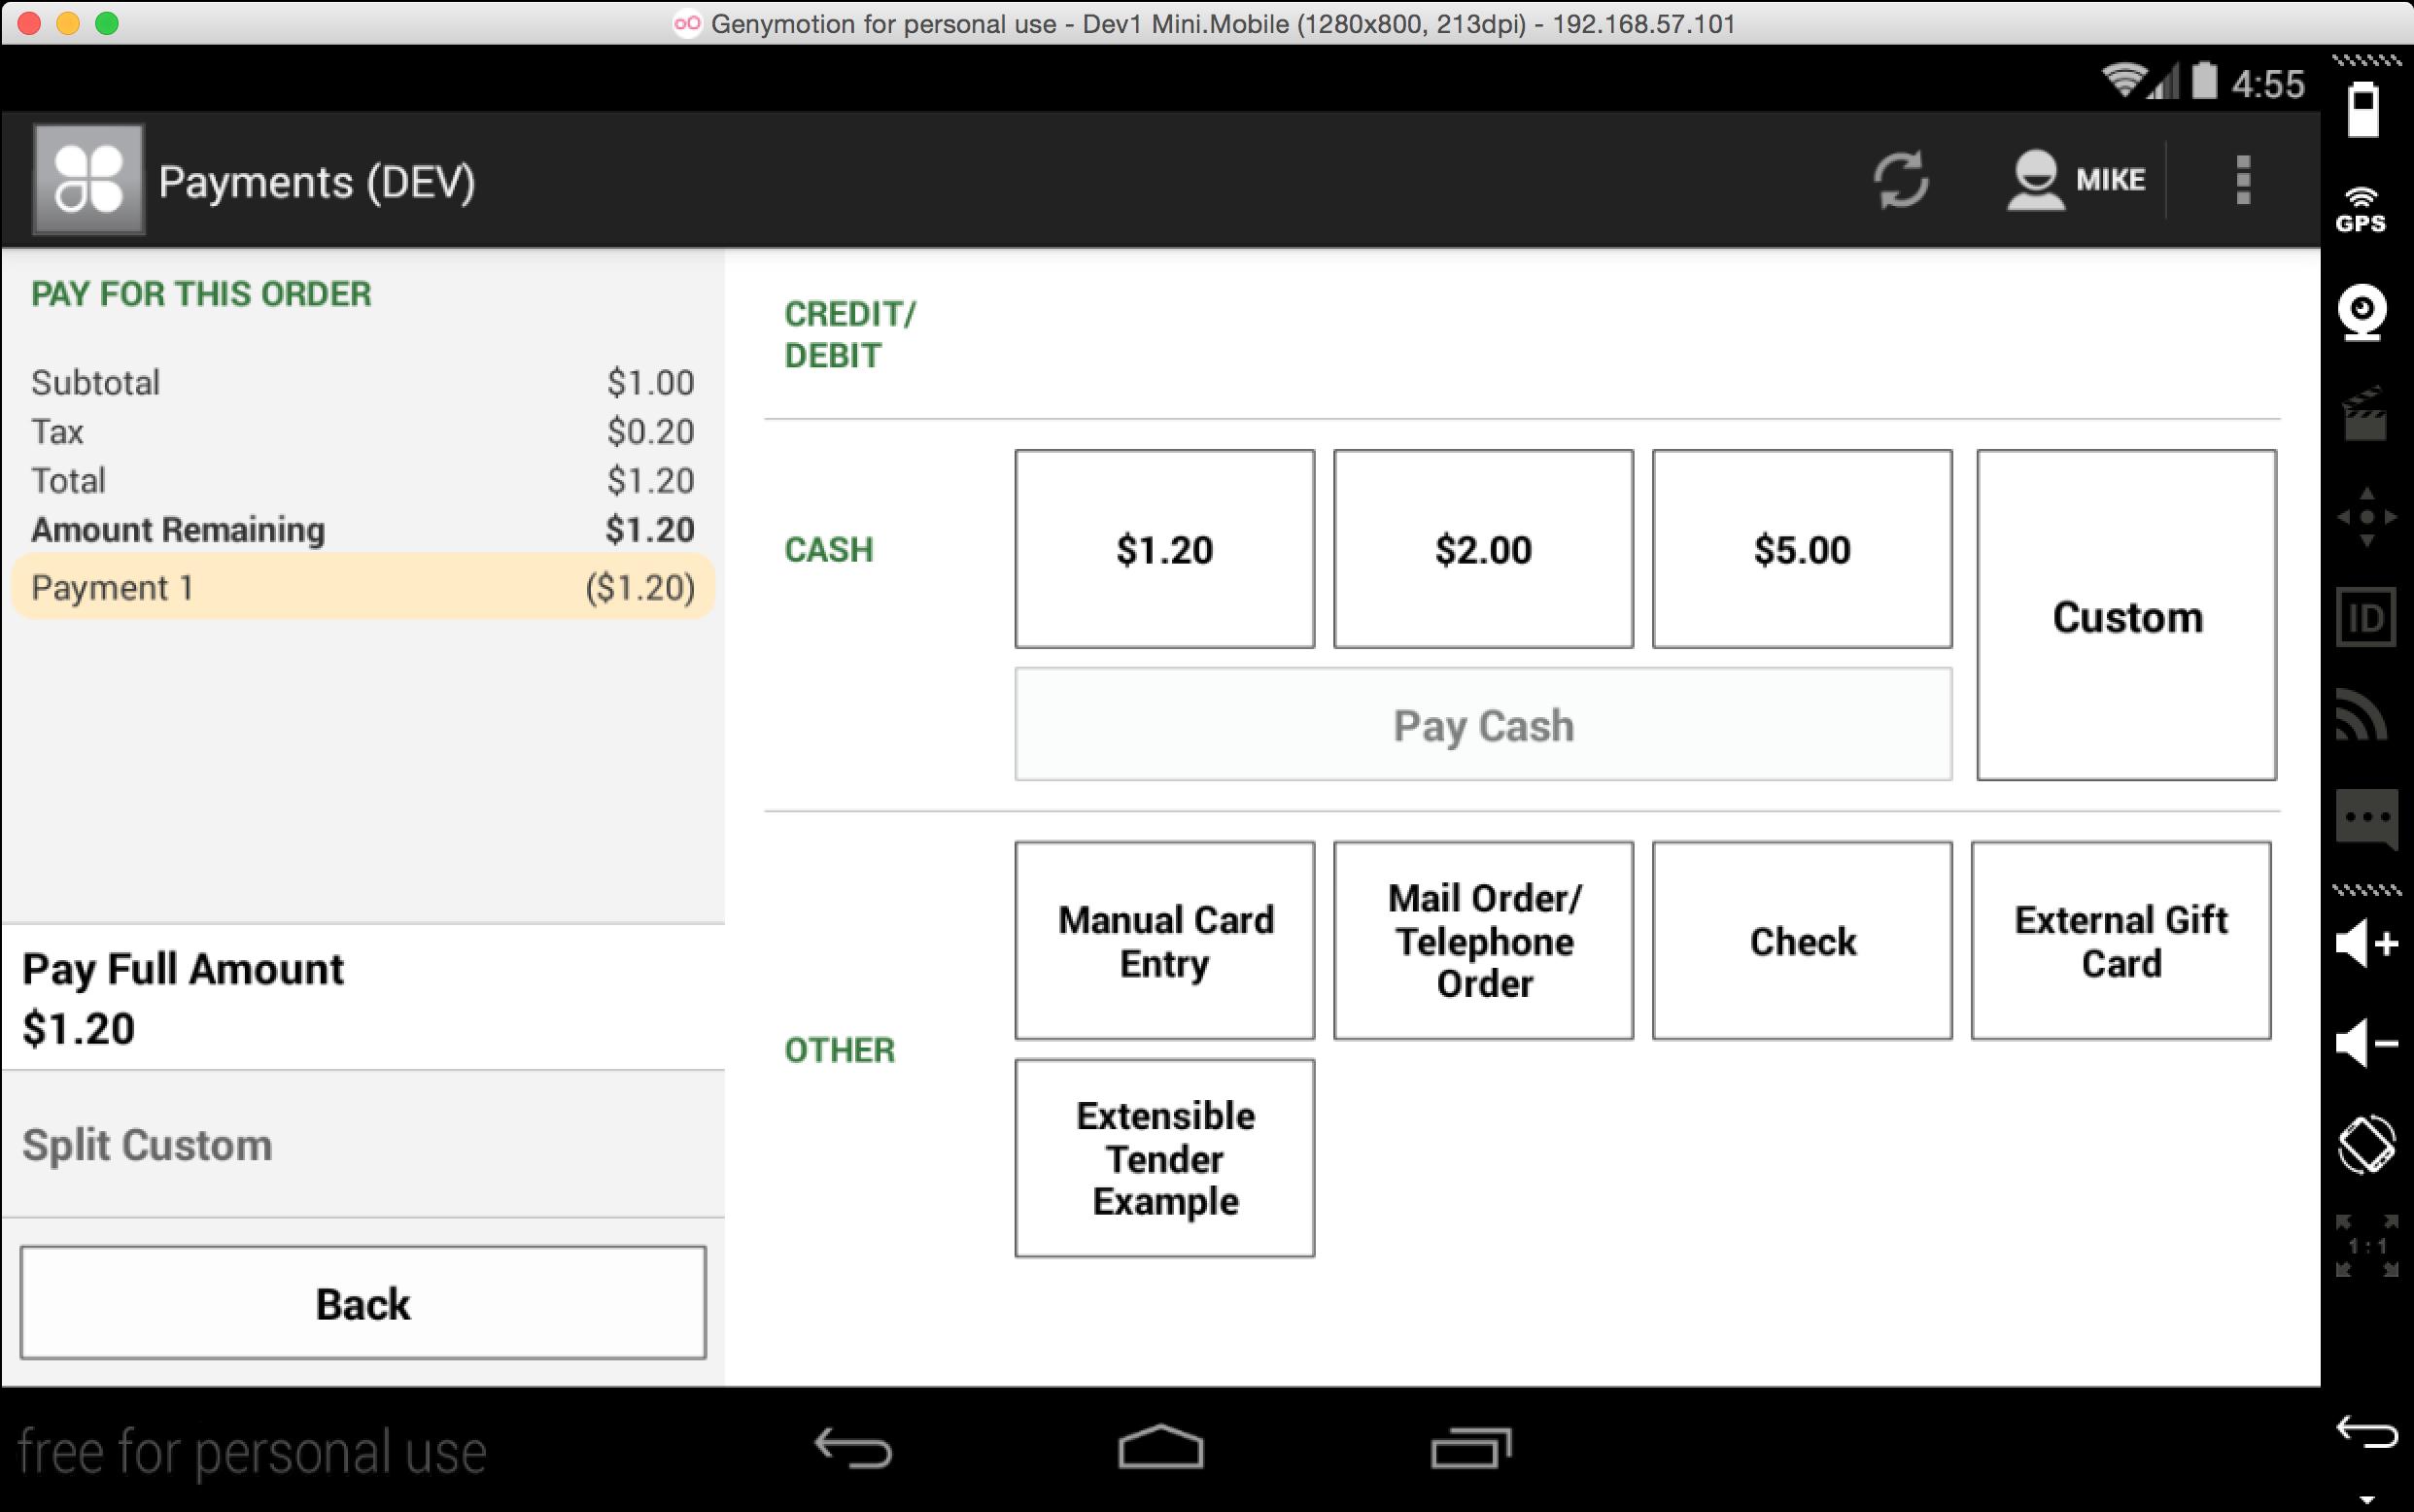 Custom Tender: Merchant-facing button in the Register app